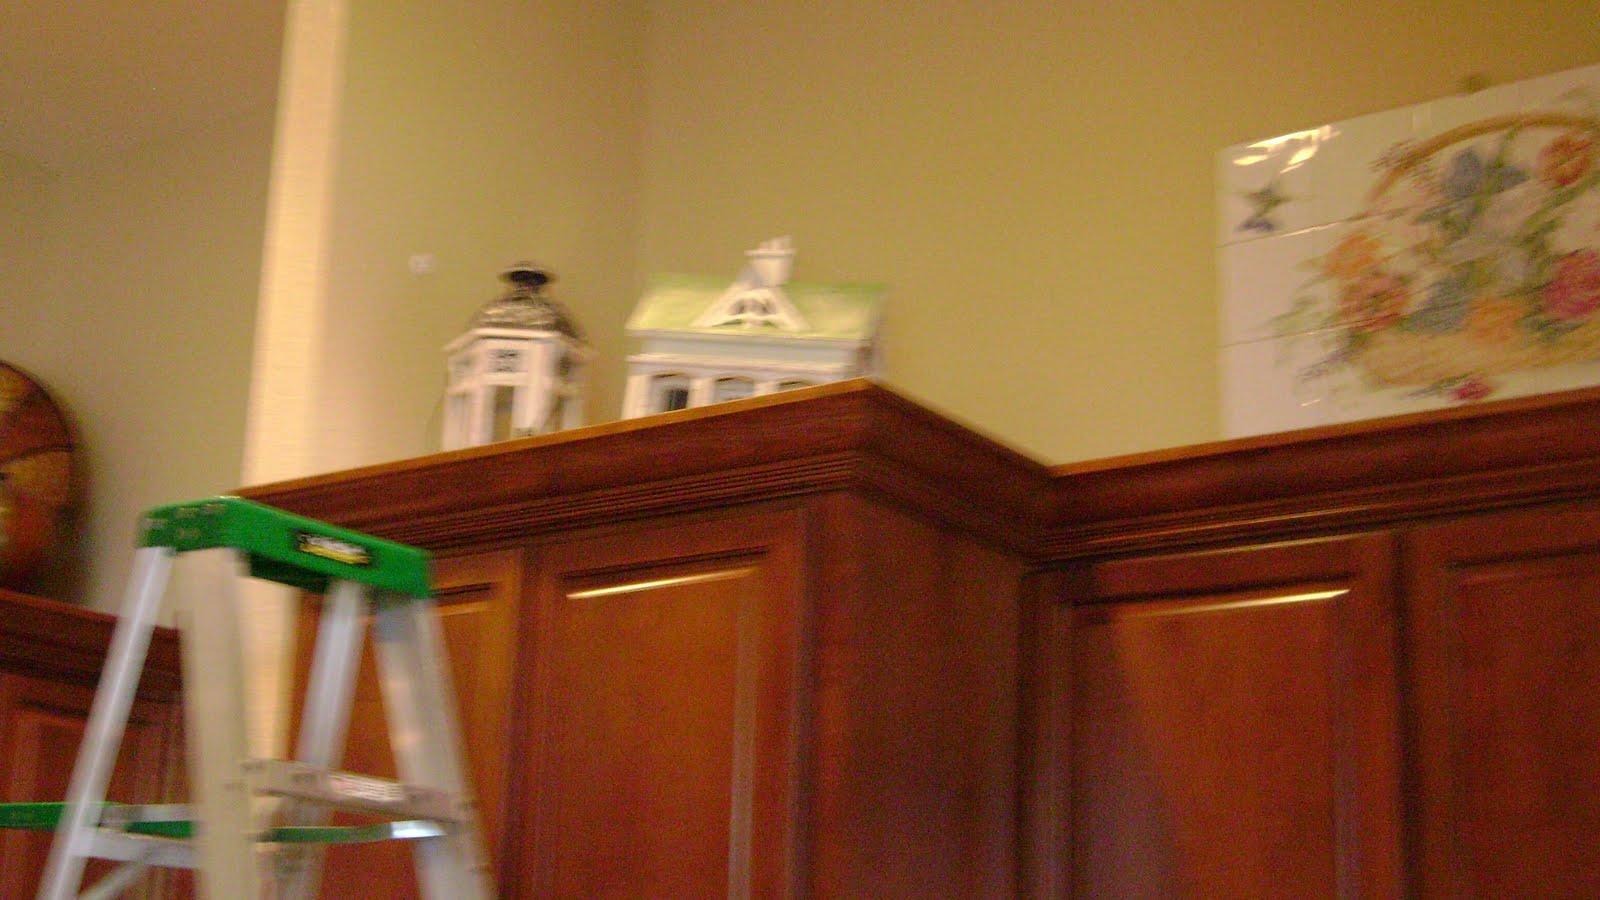 Cheryl Smith Associates Interior Design: Decorating Kitchen Cabinets